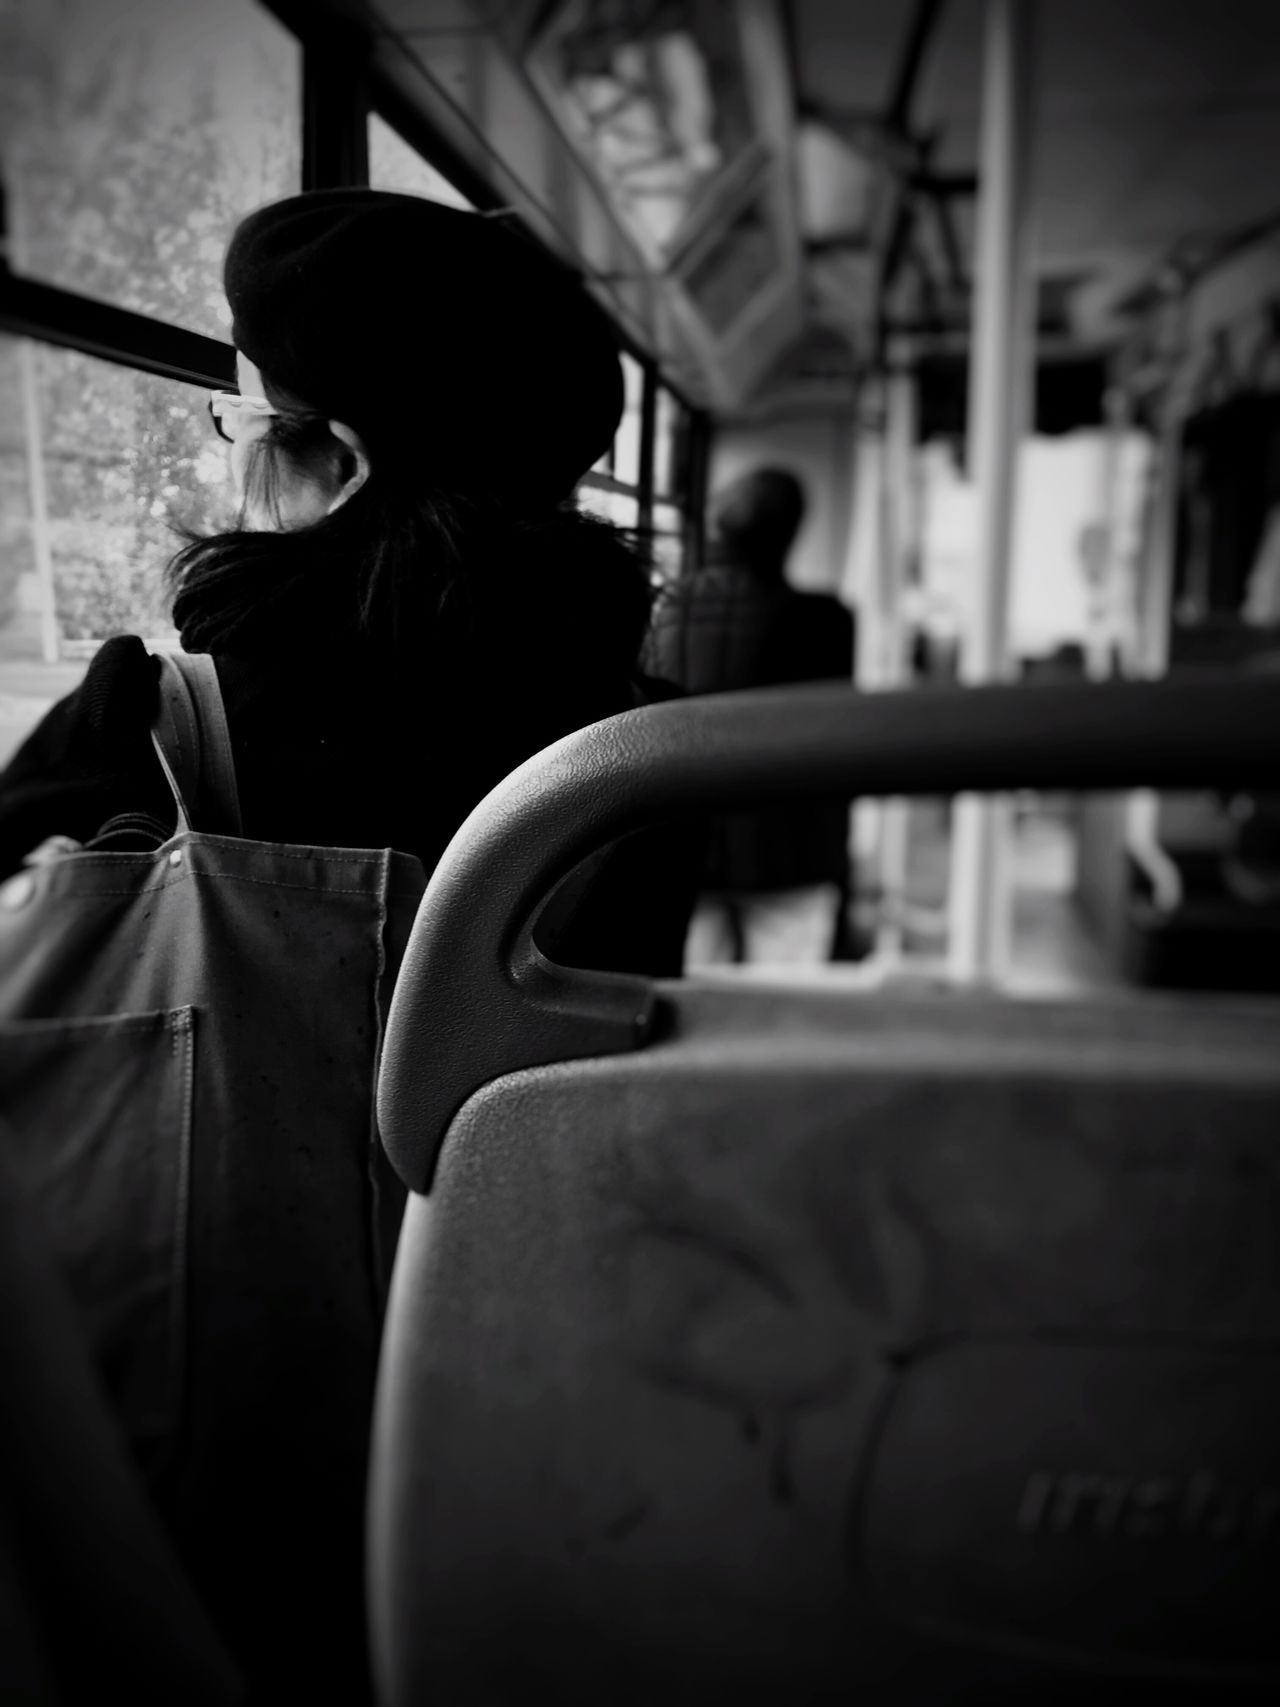 Bus Travel Wife Blackandwhite Black And White Black & White Black&white